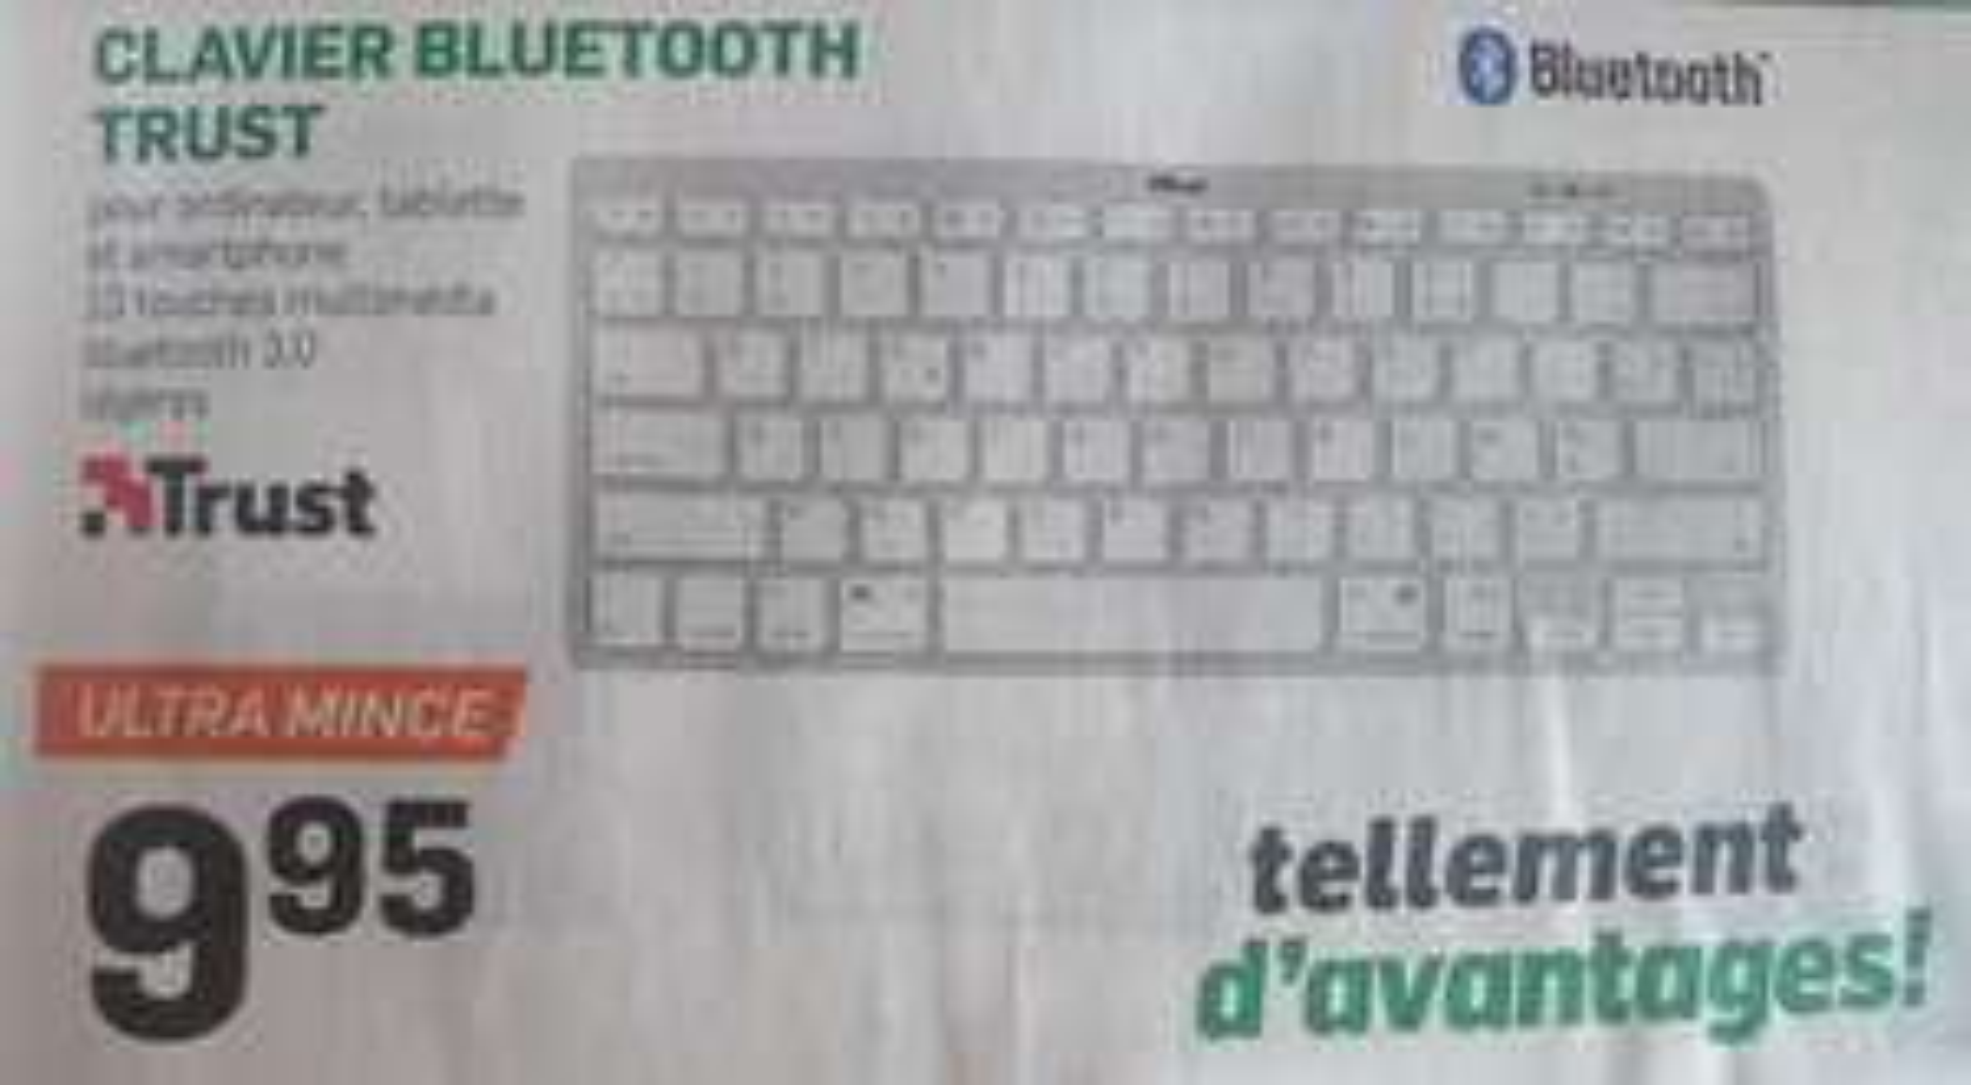 Clavier bluetooth Trust